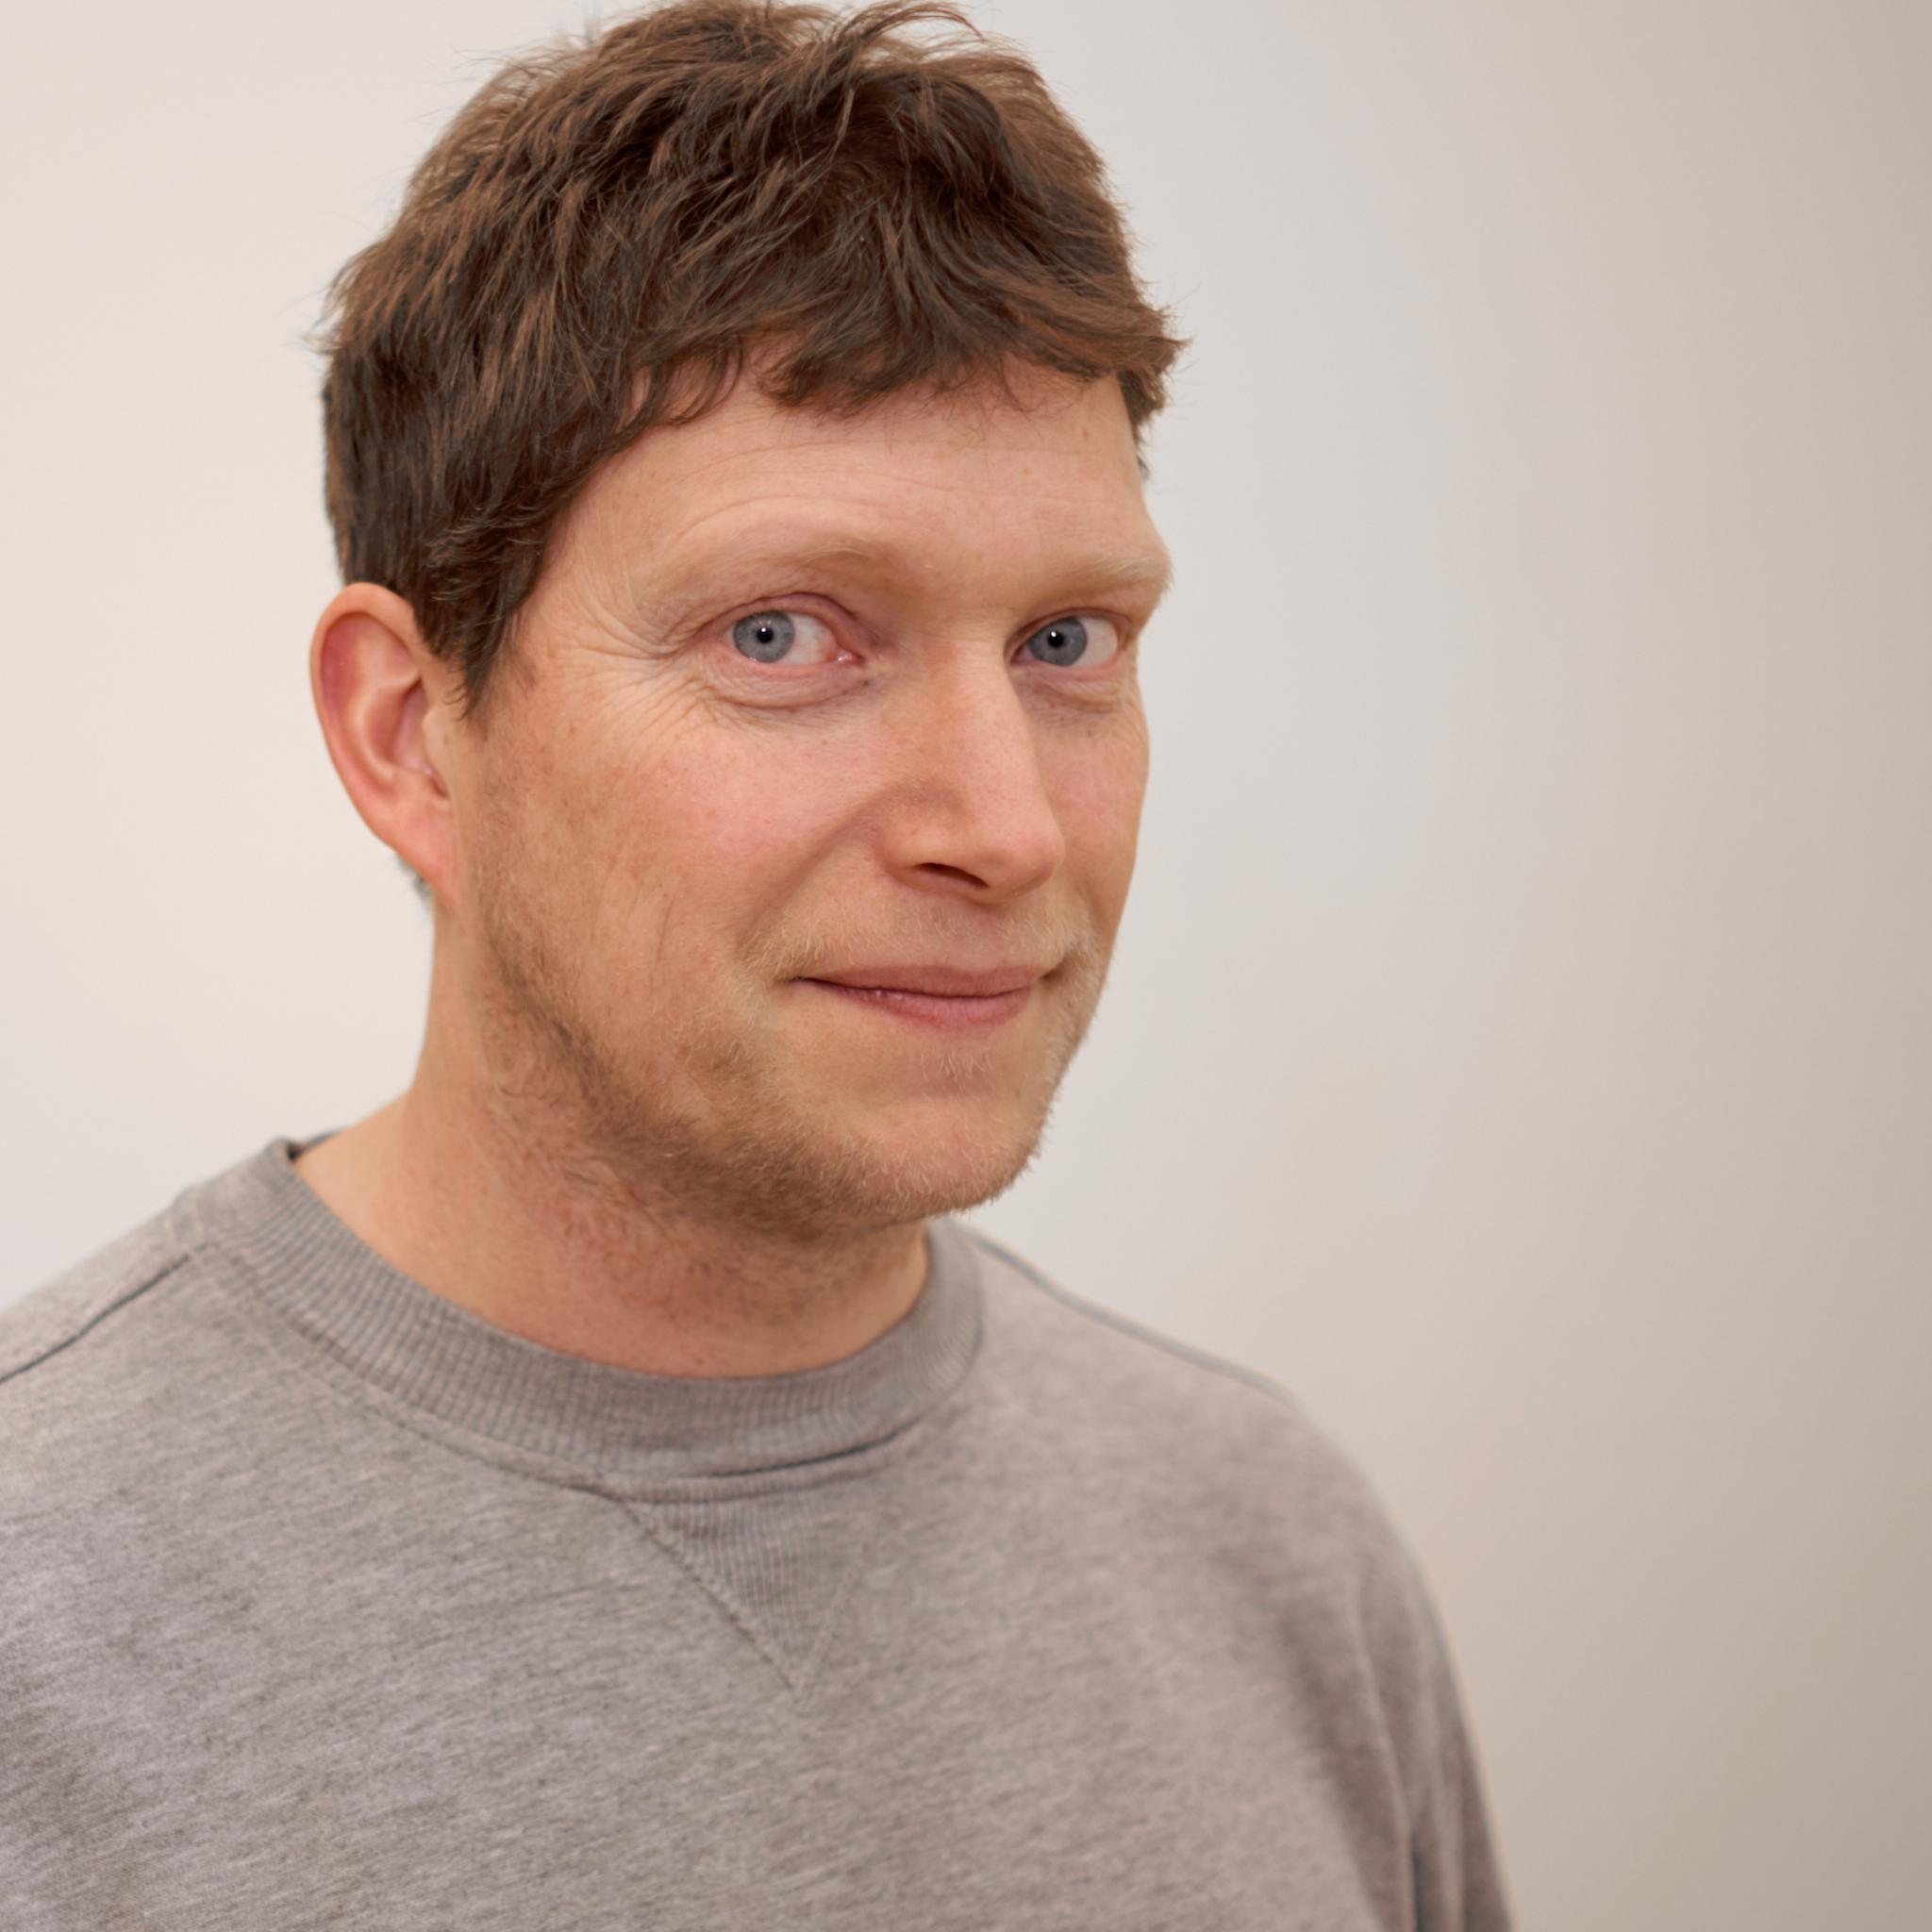 Jens Nilsson   Technical Manager   jens.nilsson@givaudan.com  +46 340 66 12 56